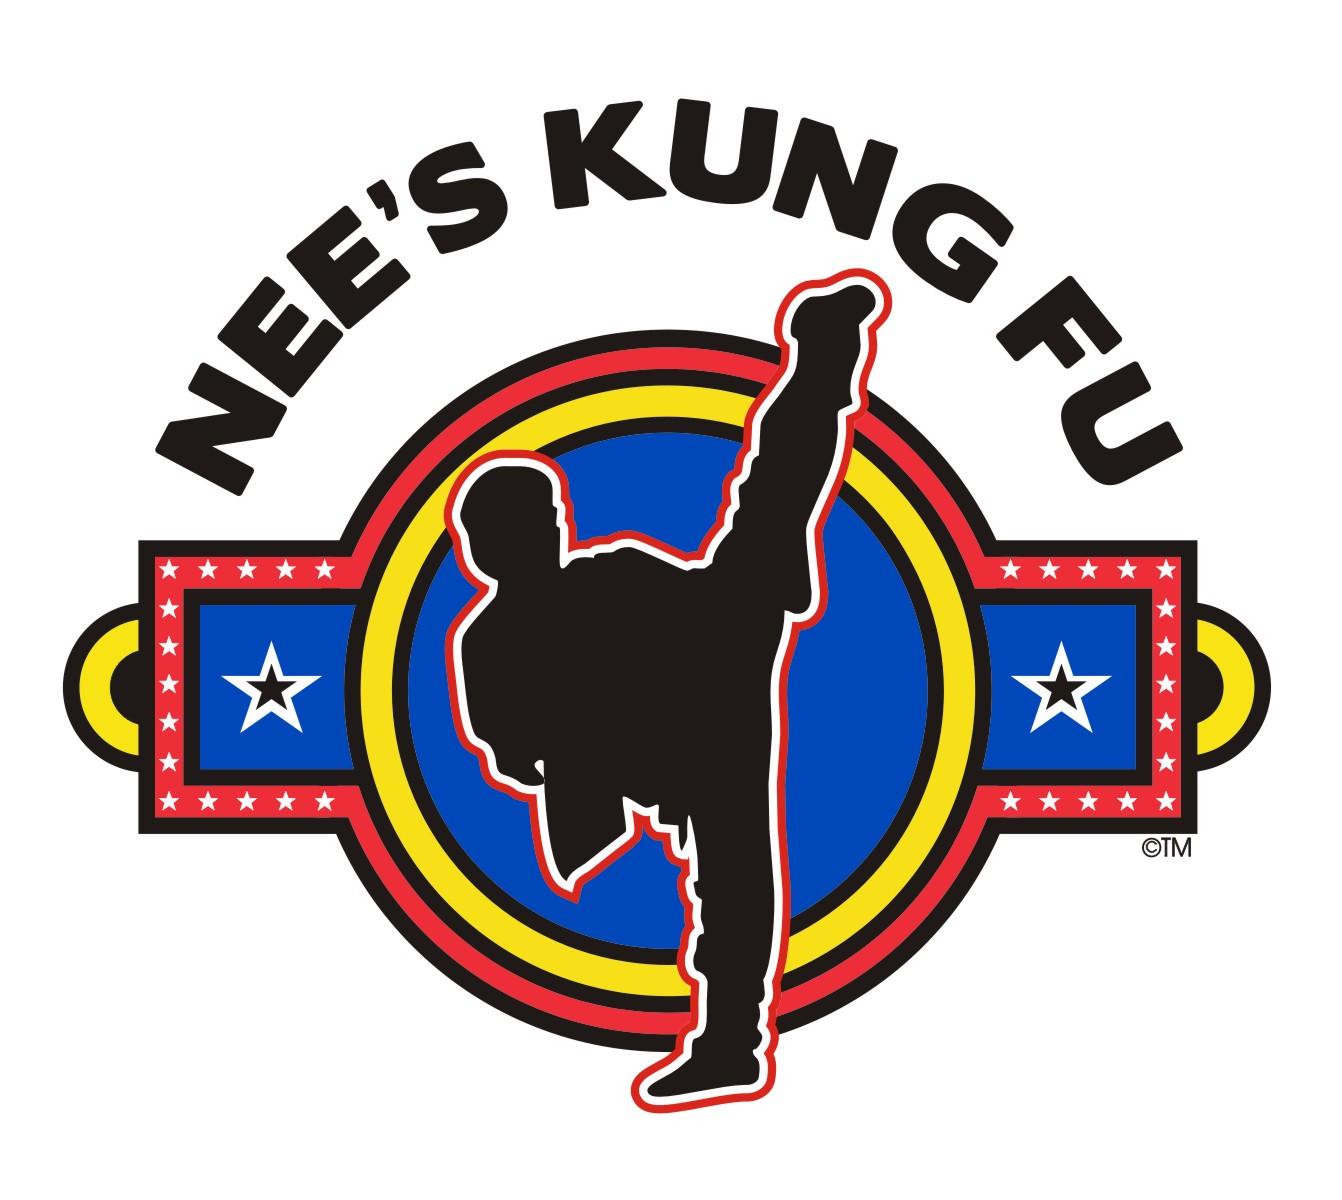 Nee's  KUNG FU ARTWORK